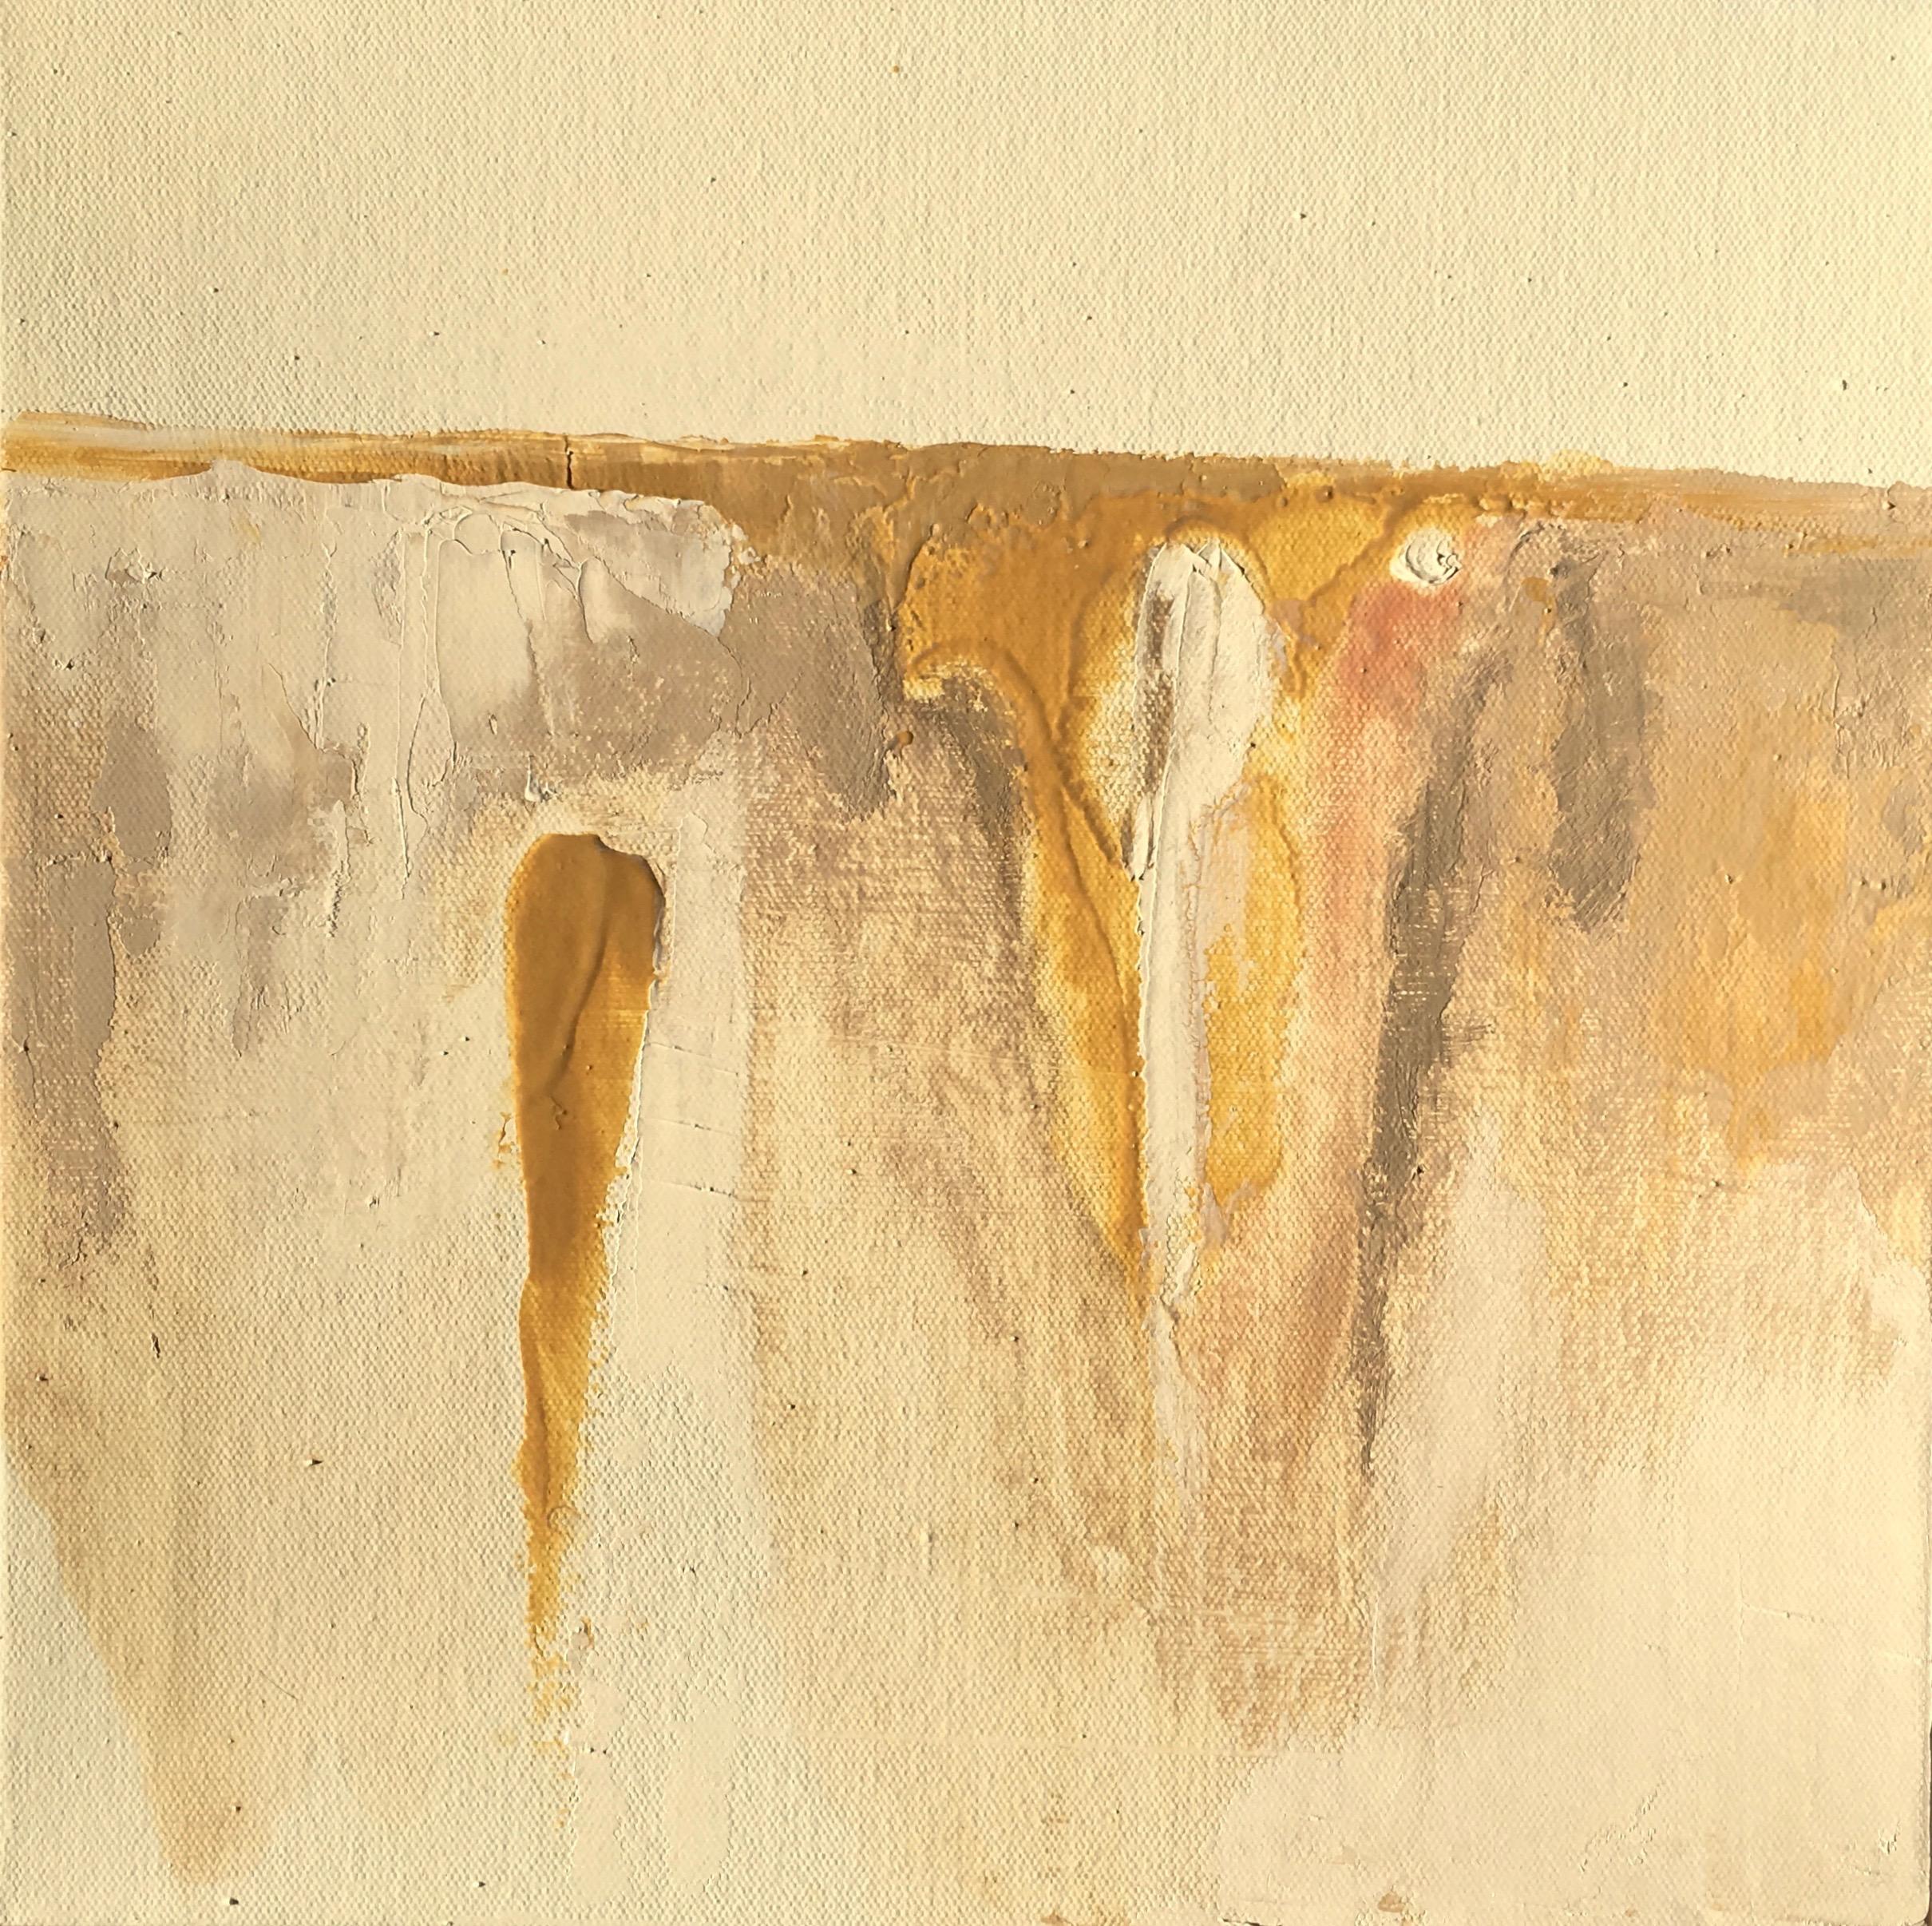 Oil on Canvas 12 x 12